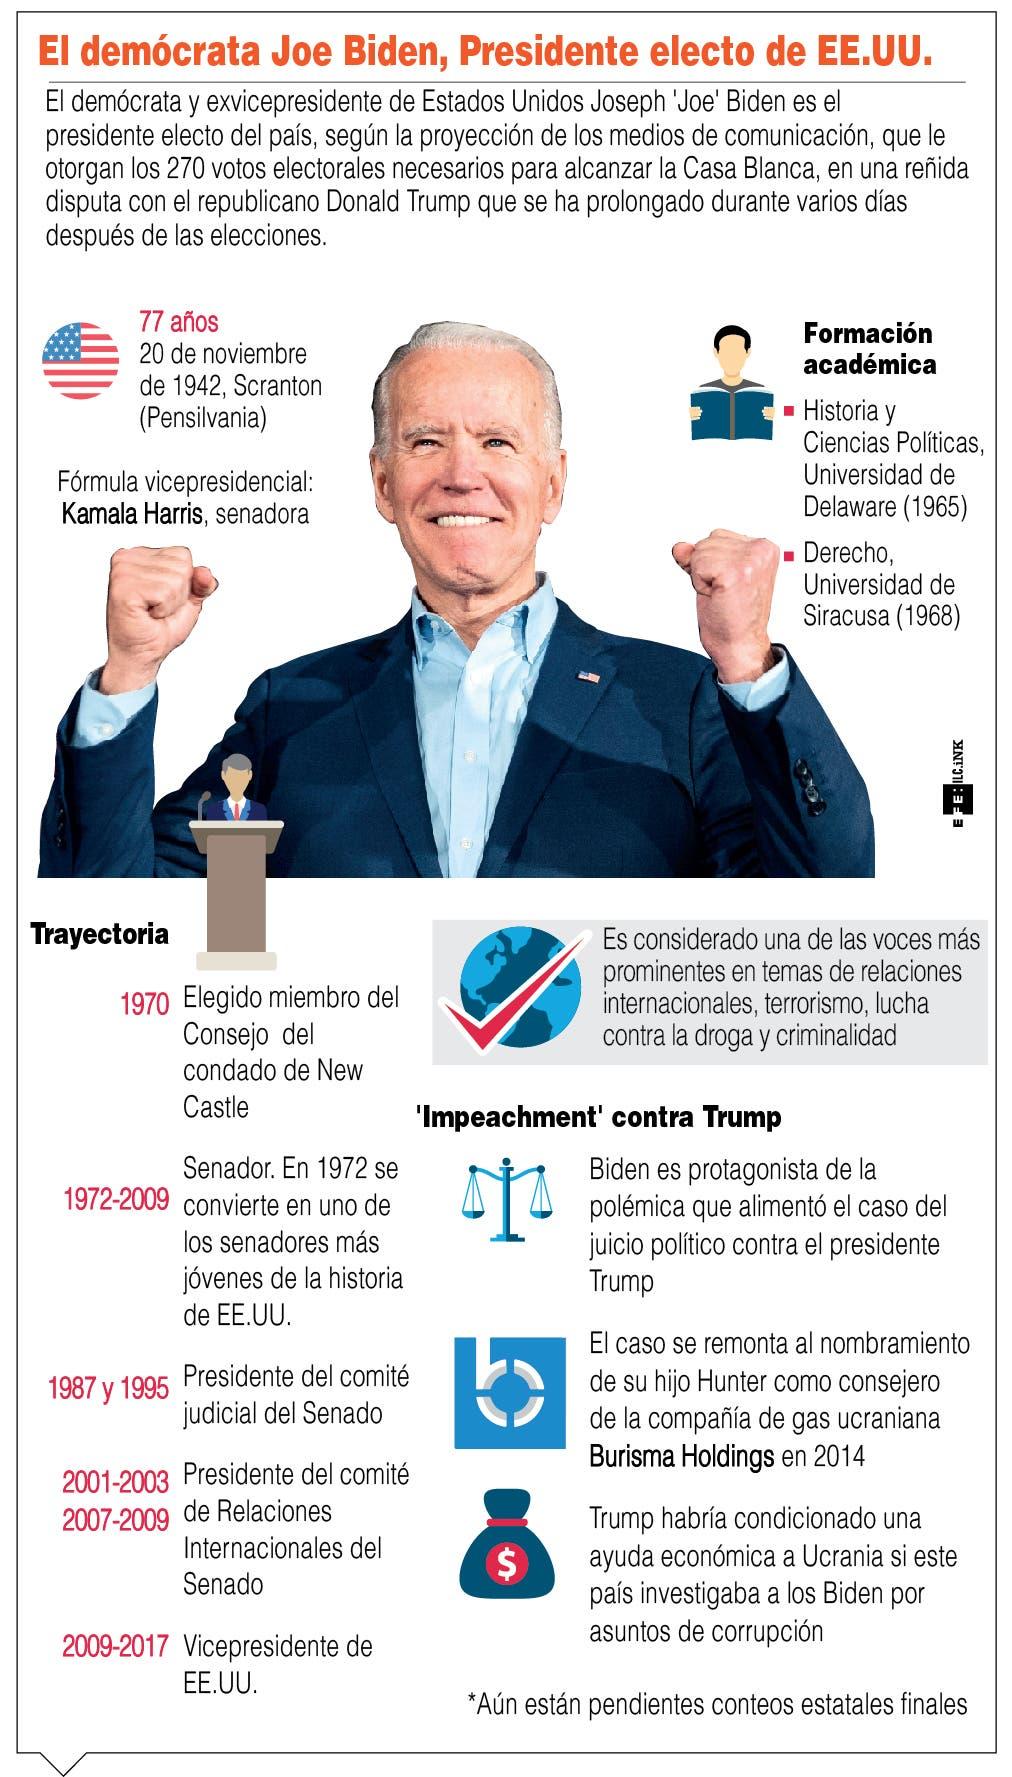 La ONU felicita a Joe Biden como presidente electo de Estados Unidos